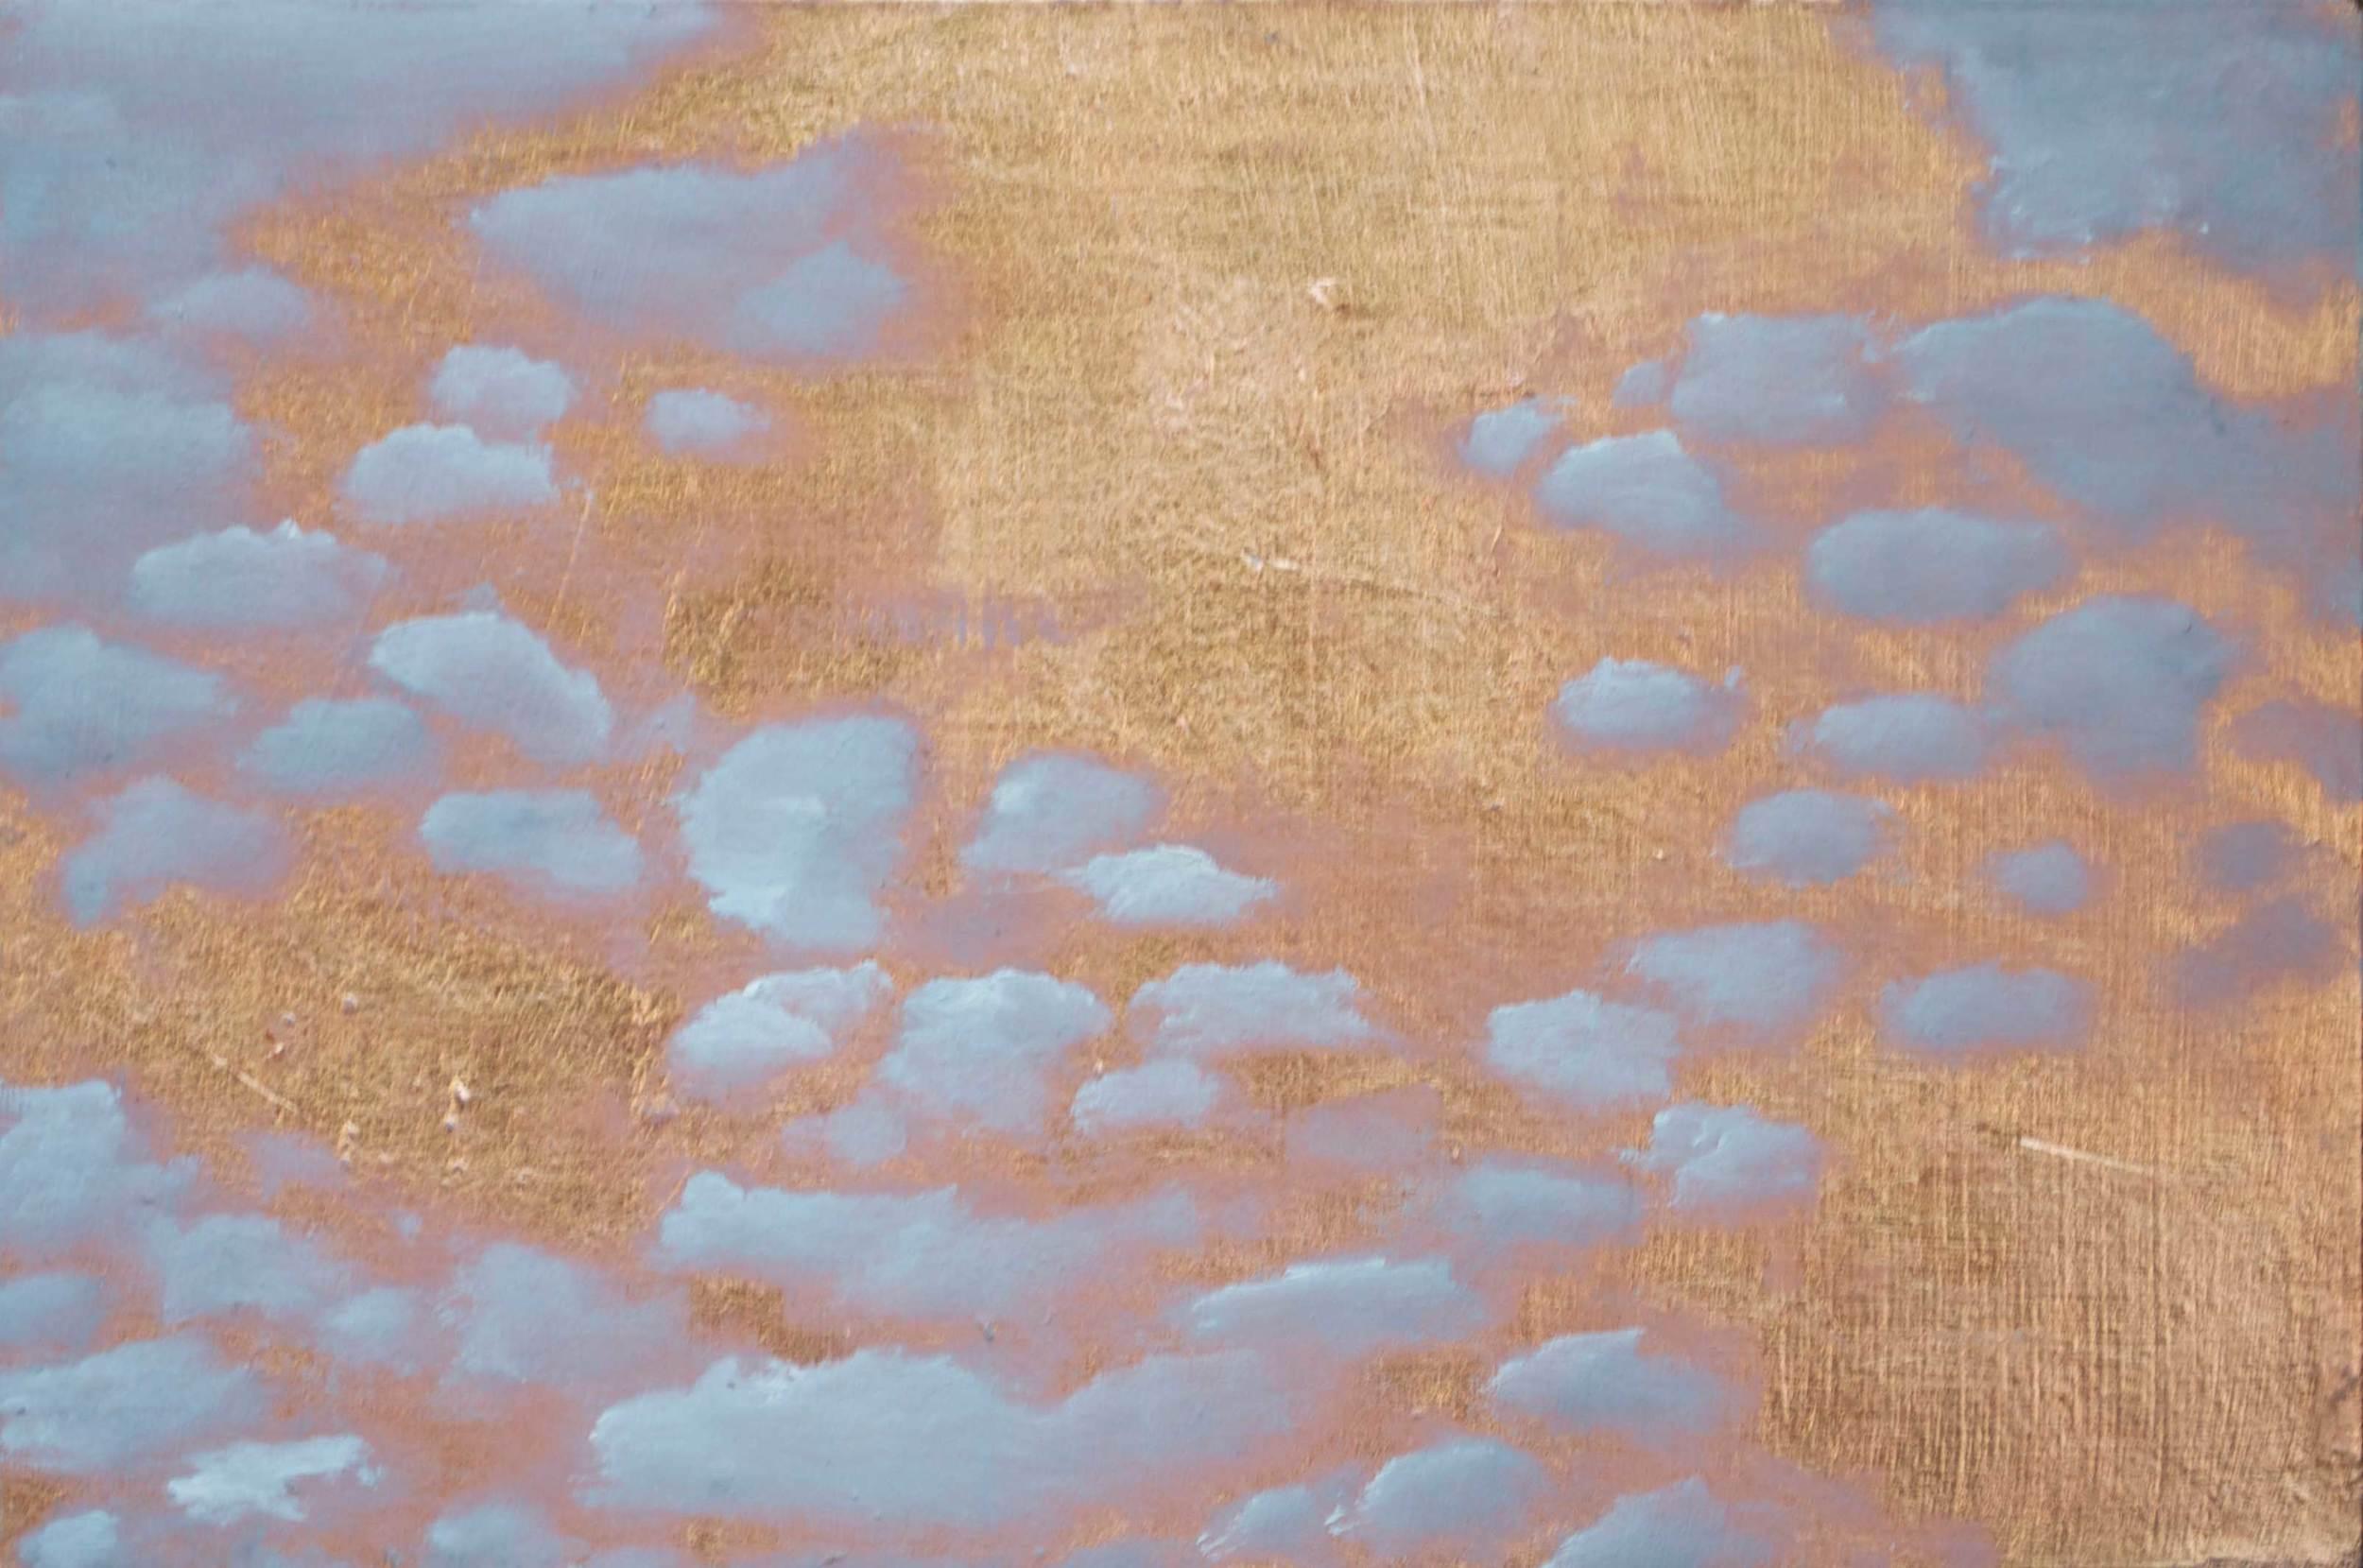 Cloud-Study-3-15-13.jpg